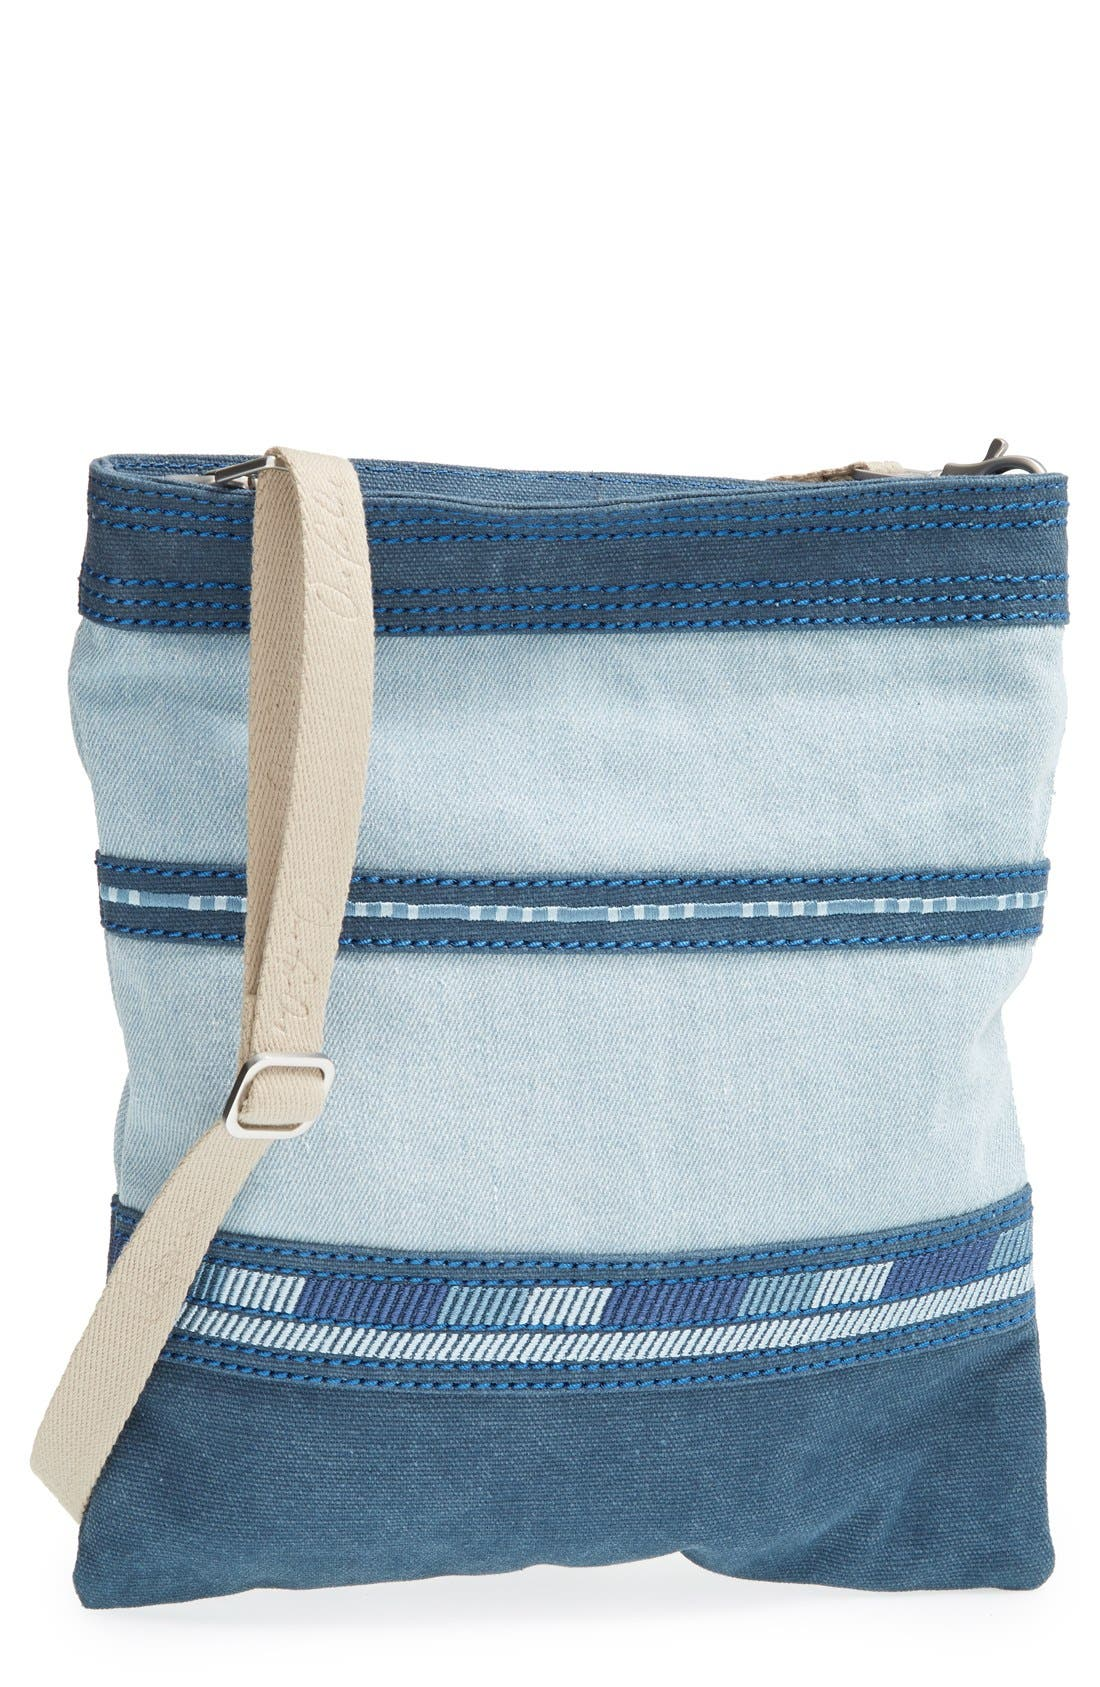 Alternate Image 1 Selected - TOMS Stripe Denim Crossbody Bag